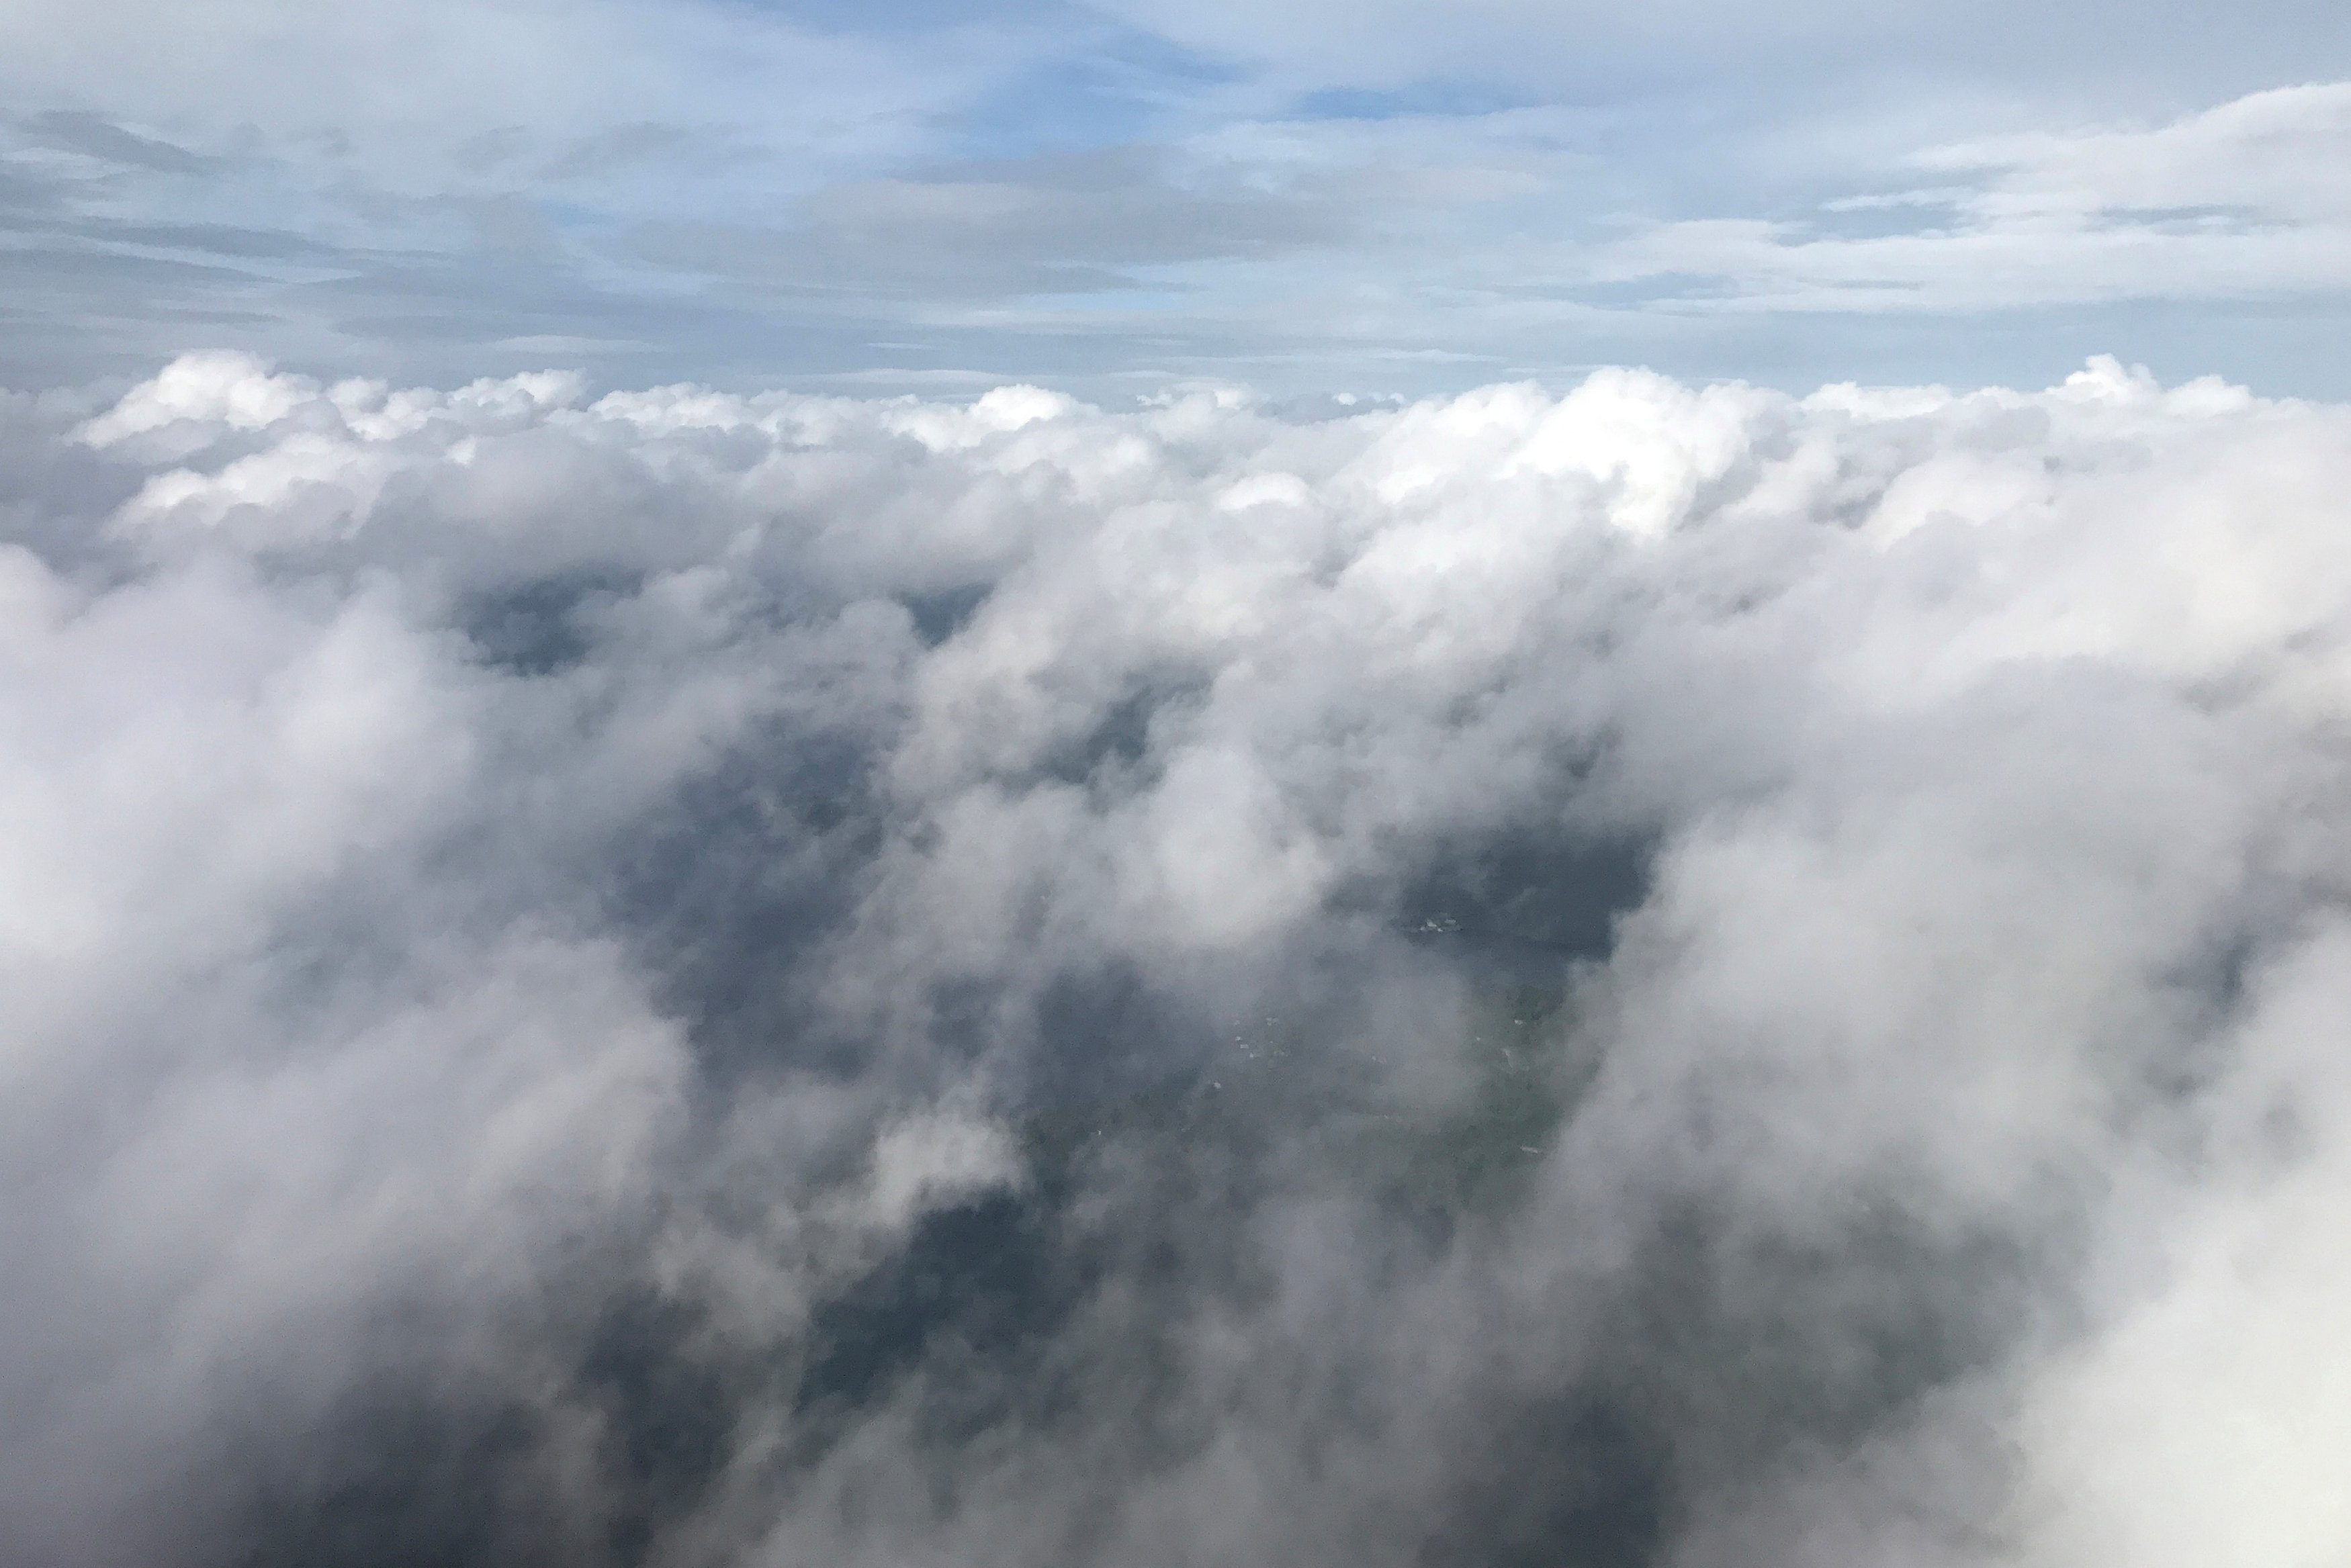 Las nubes sobre Tallahassee, Florida antes de la llegada del huracán